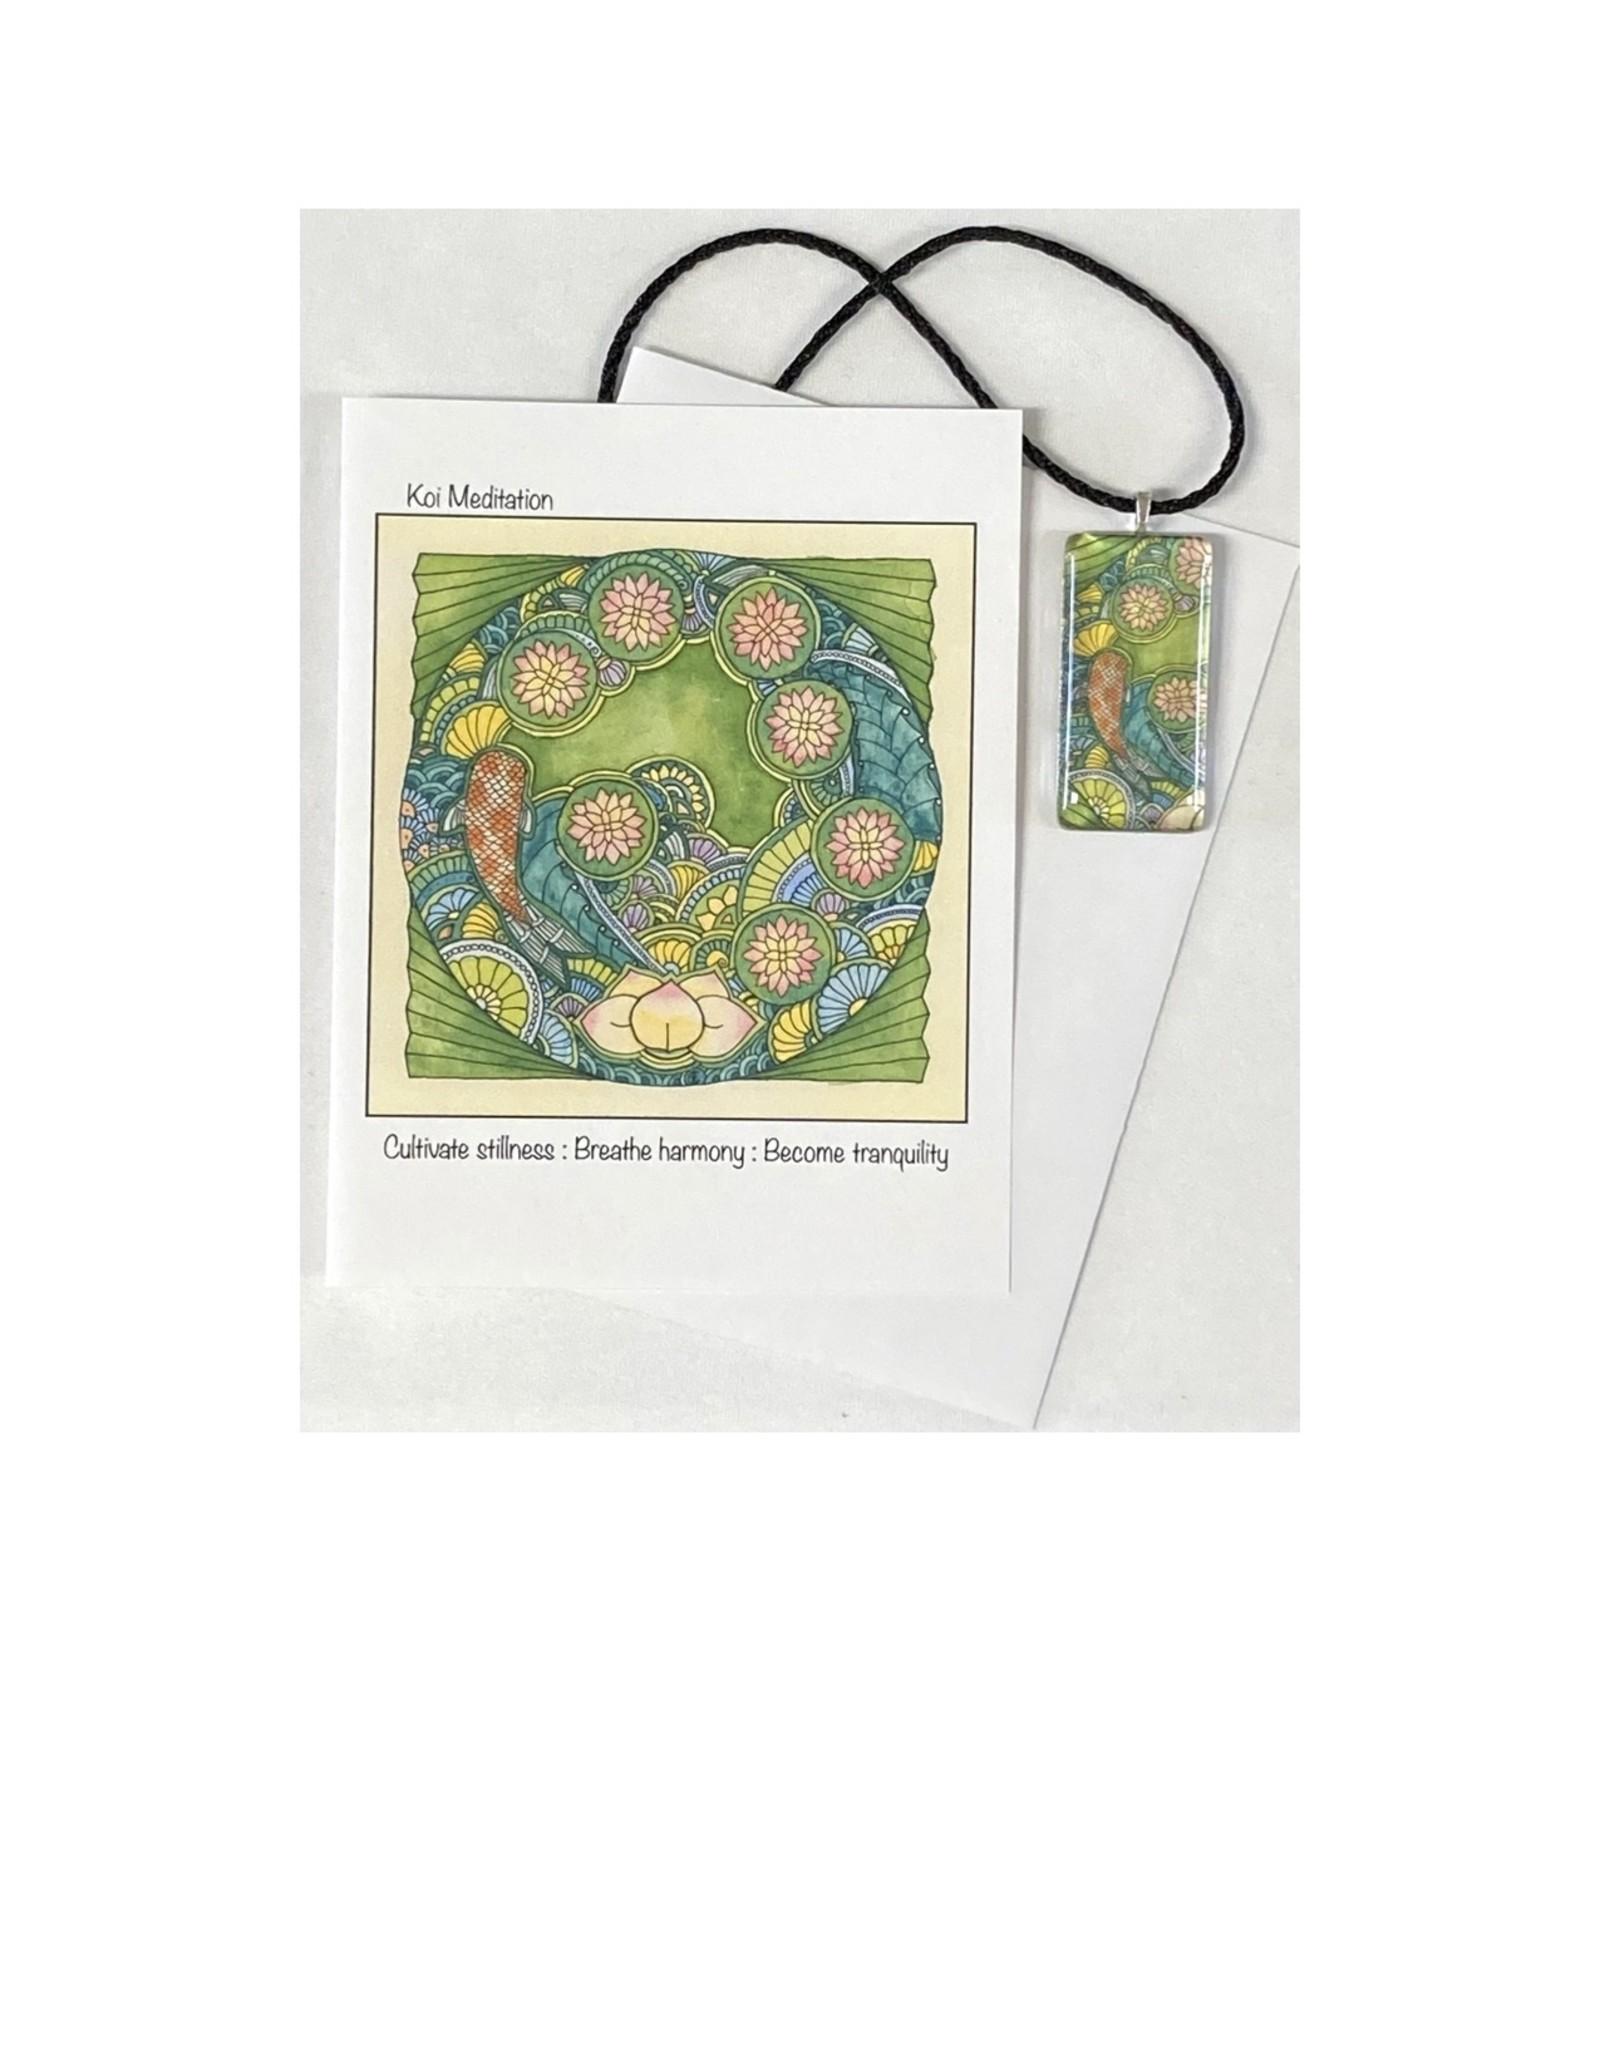 Kelly Casperson Koi Meditation pendant & card